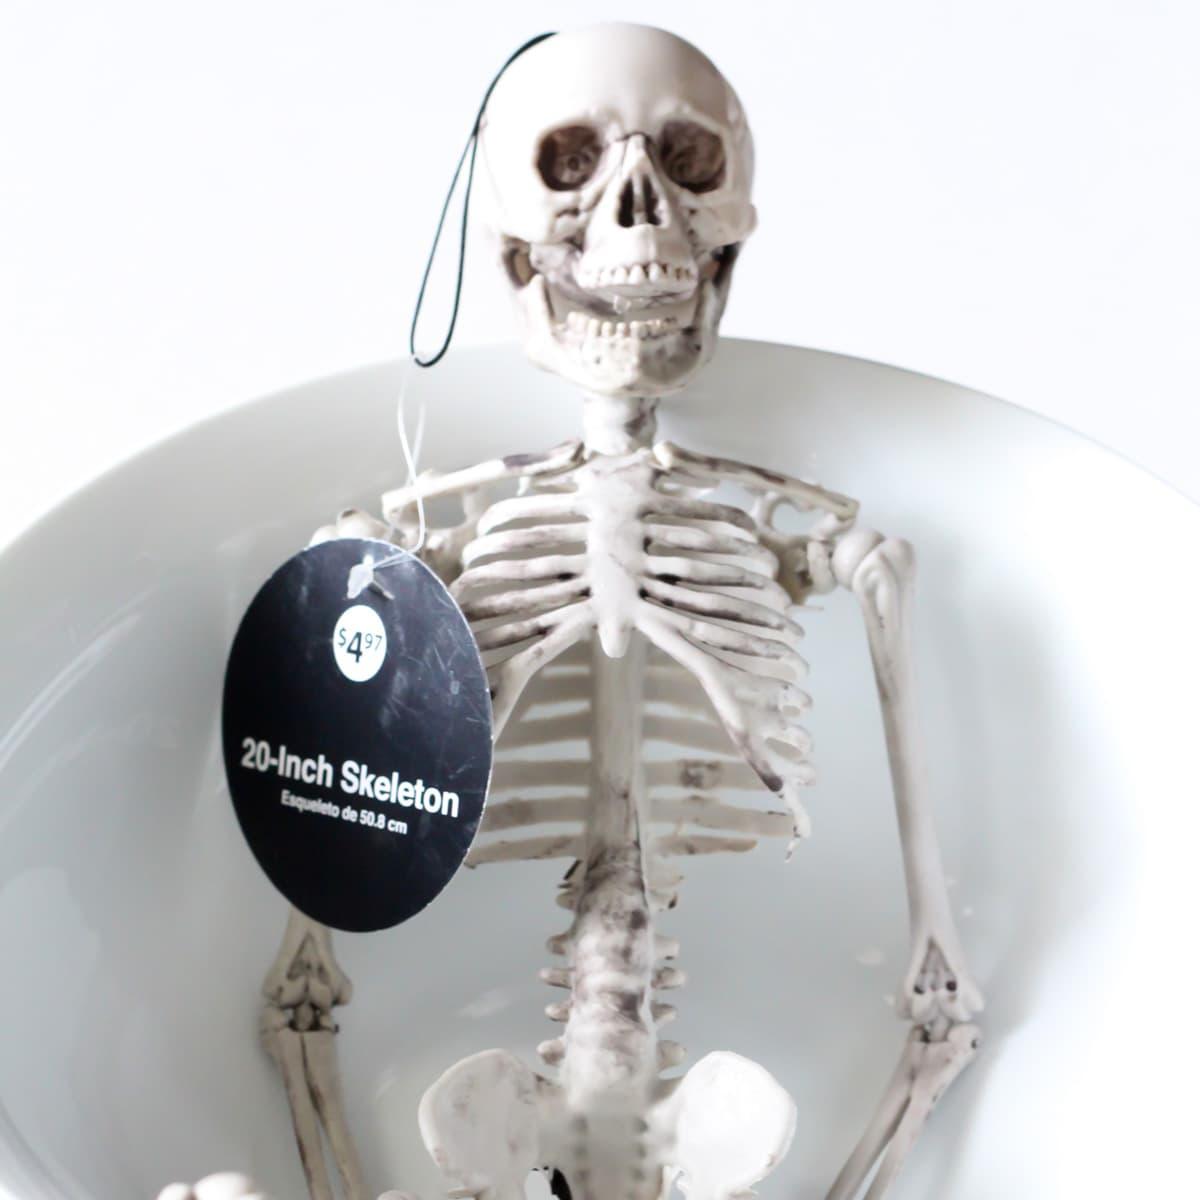 Skeleton in a white bowl